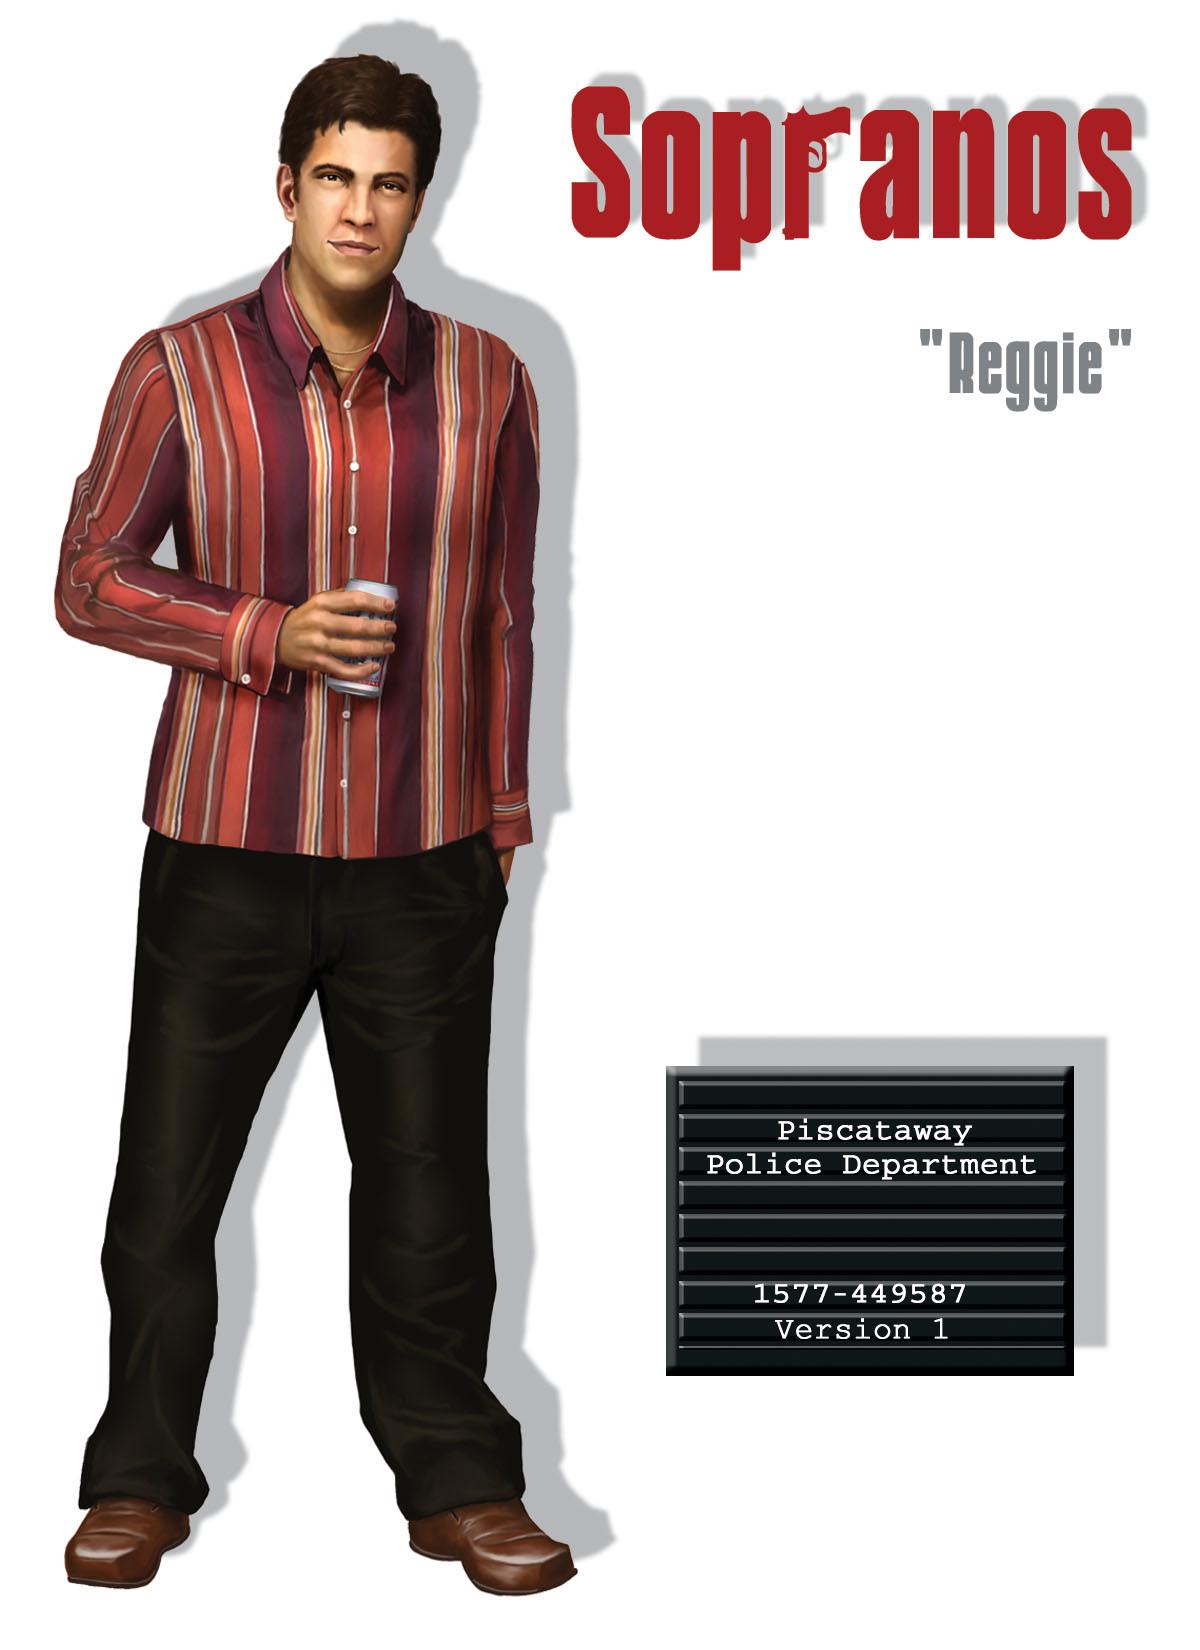 Jeff zugale sop npc reggie concept 1